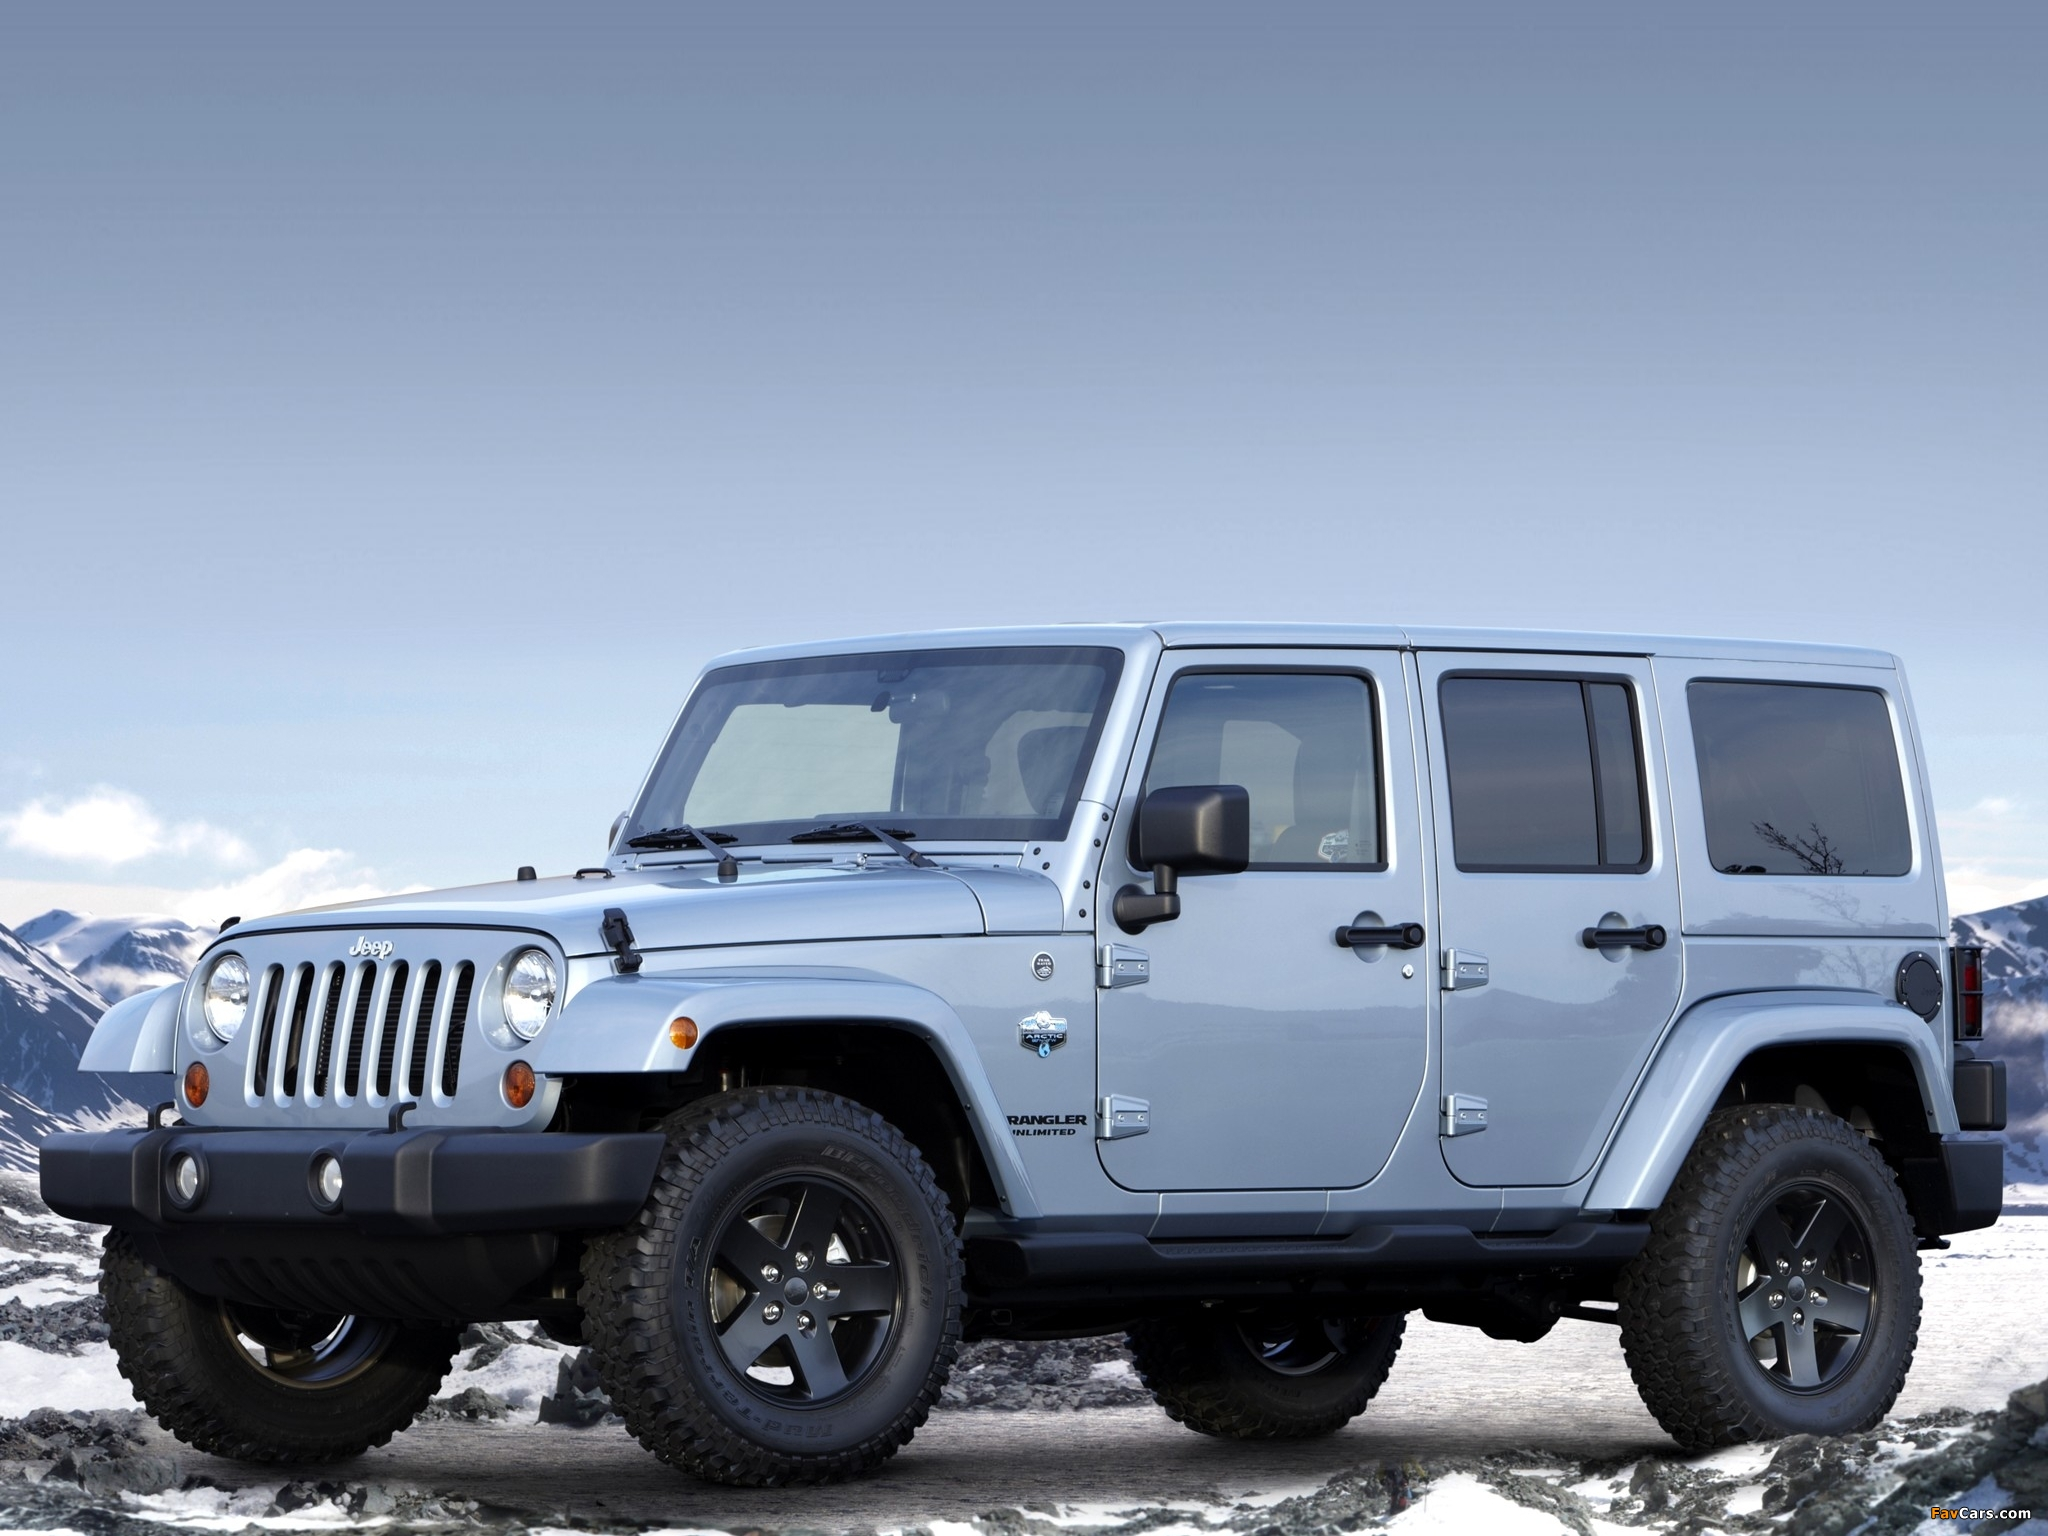 Jeep Wrangler Unlimited Arctic (JK) 2012 photos (2048 x 1536)